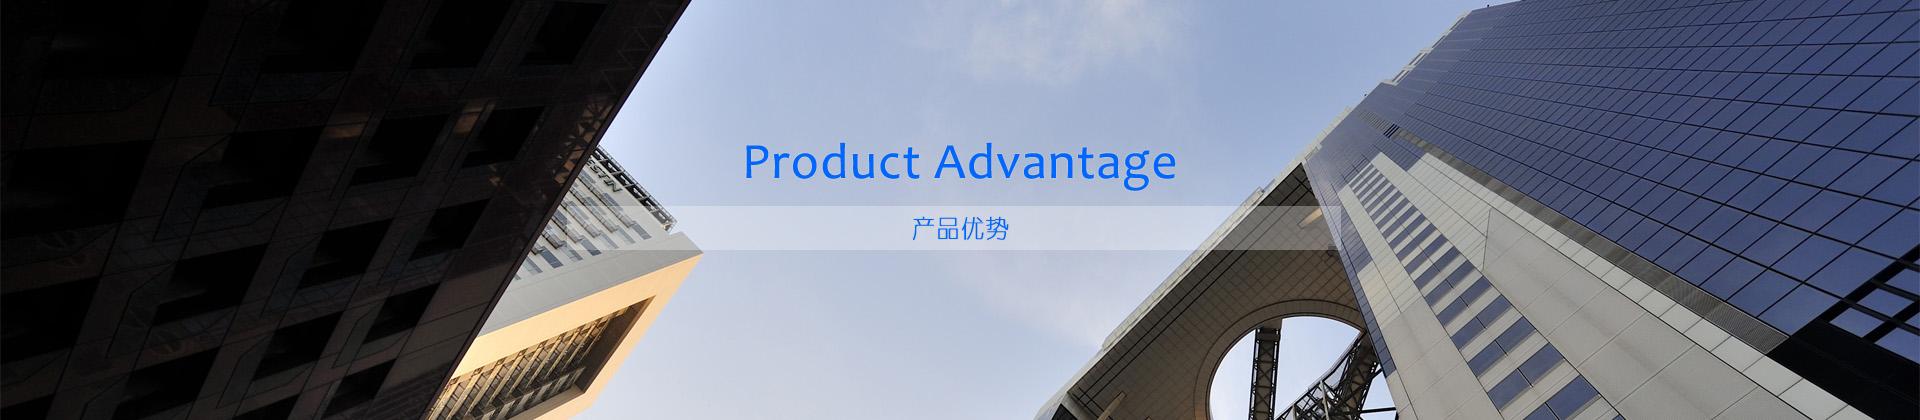 恒安产品优势PRODUCTS